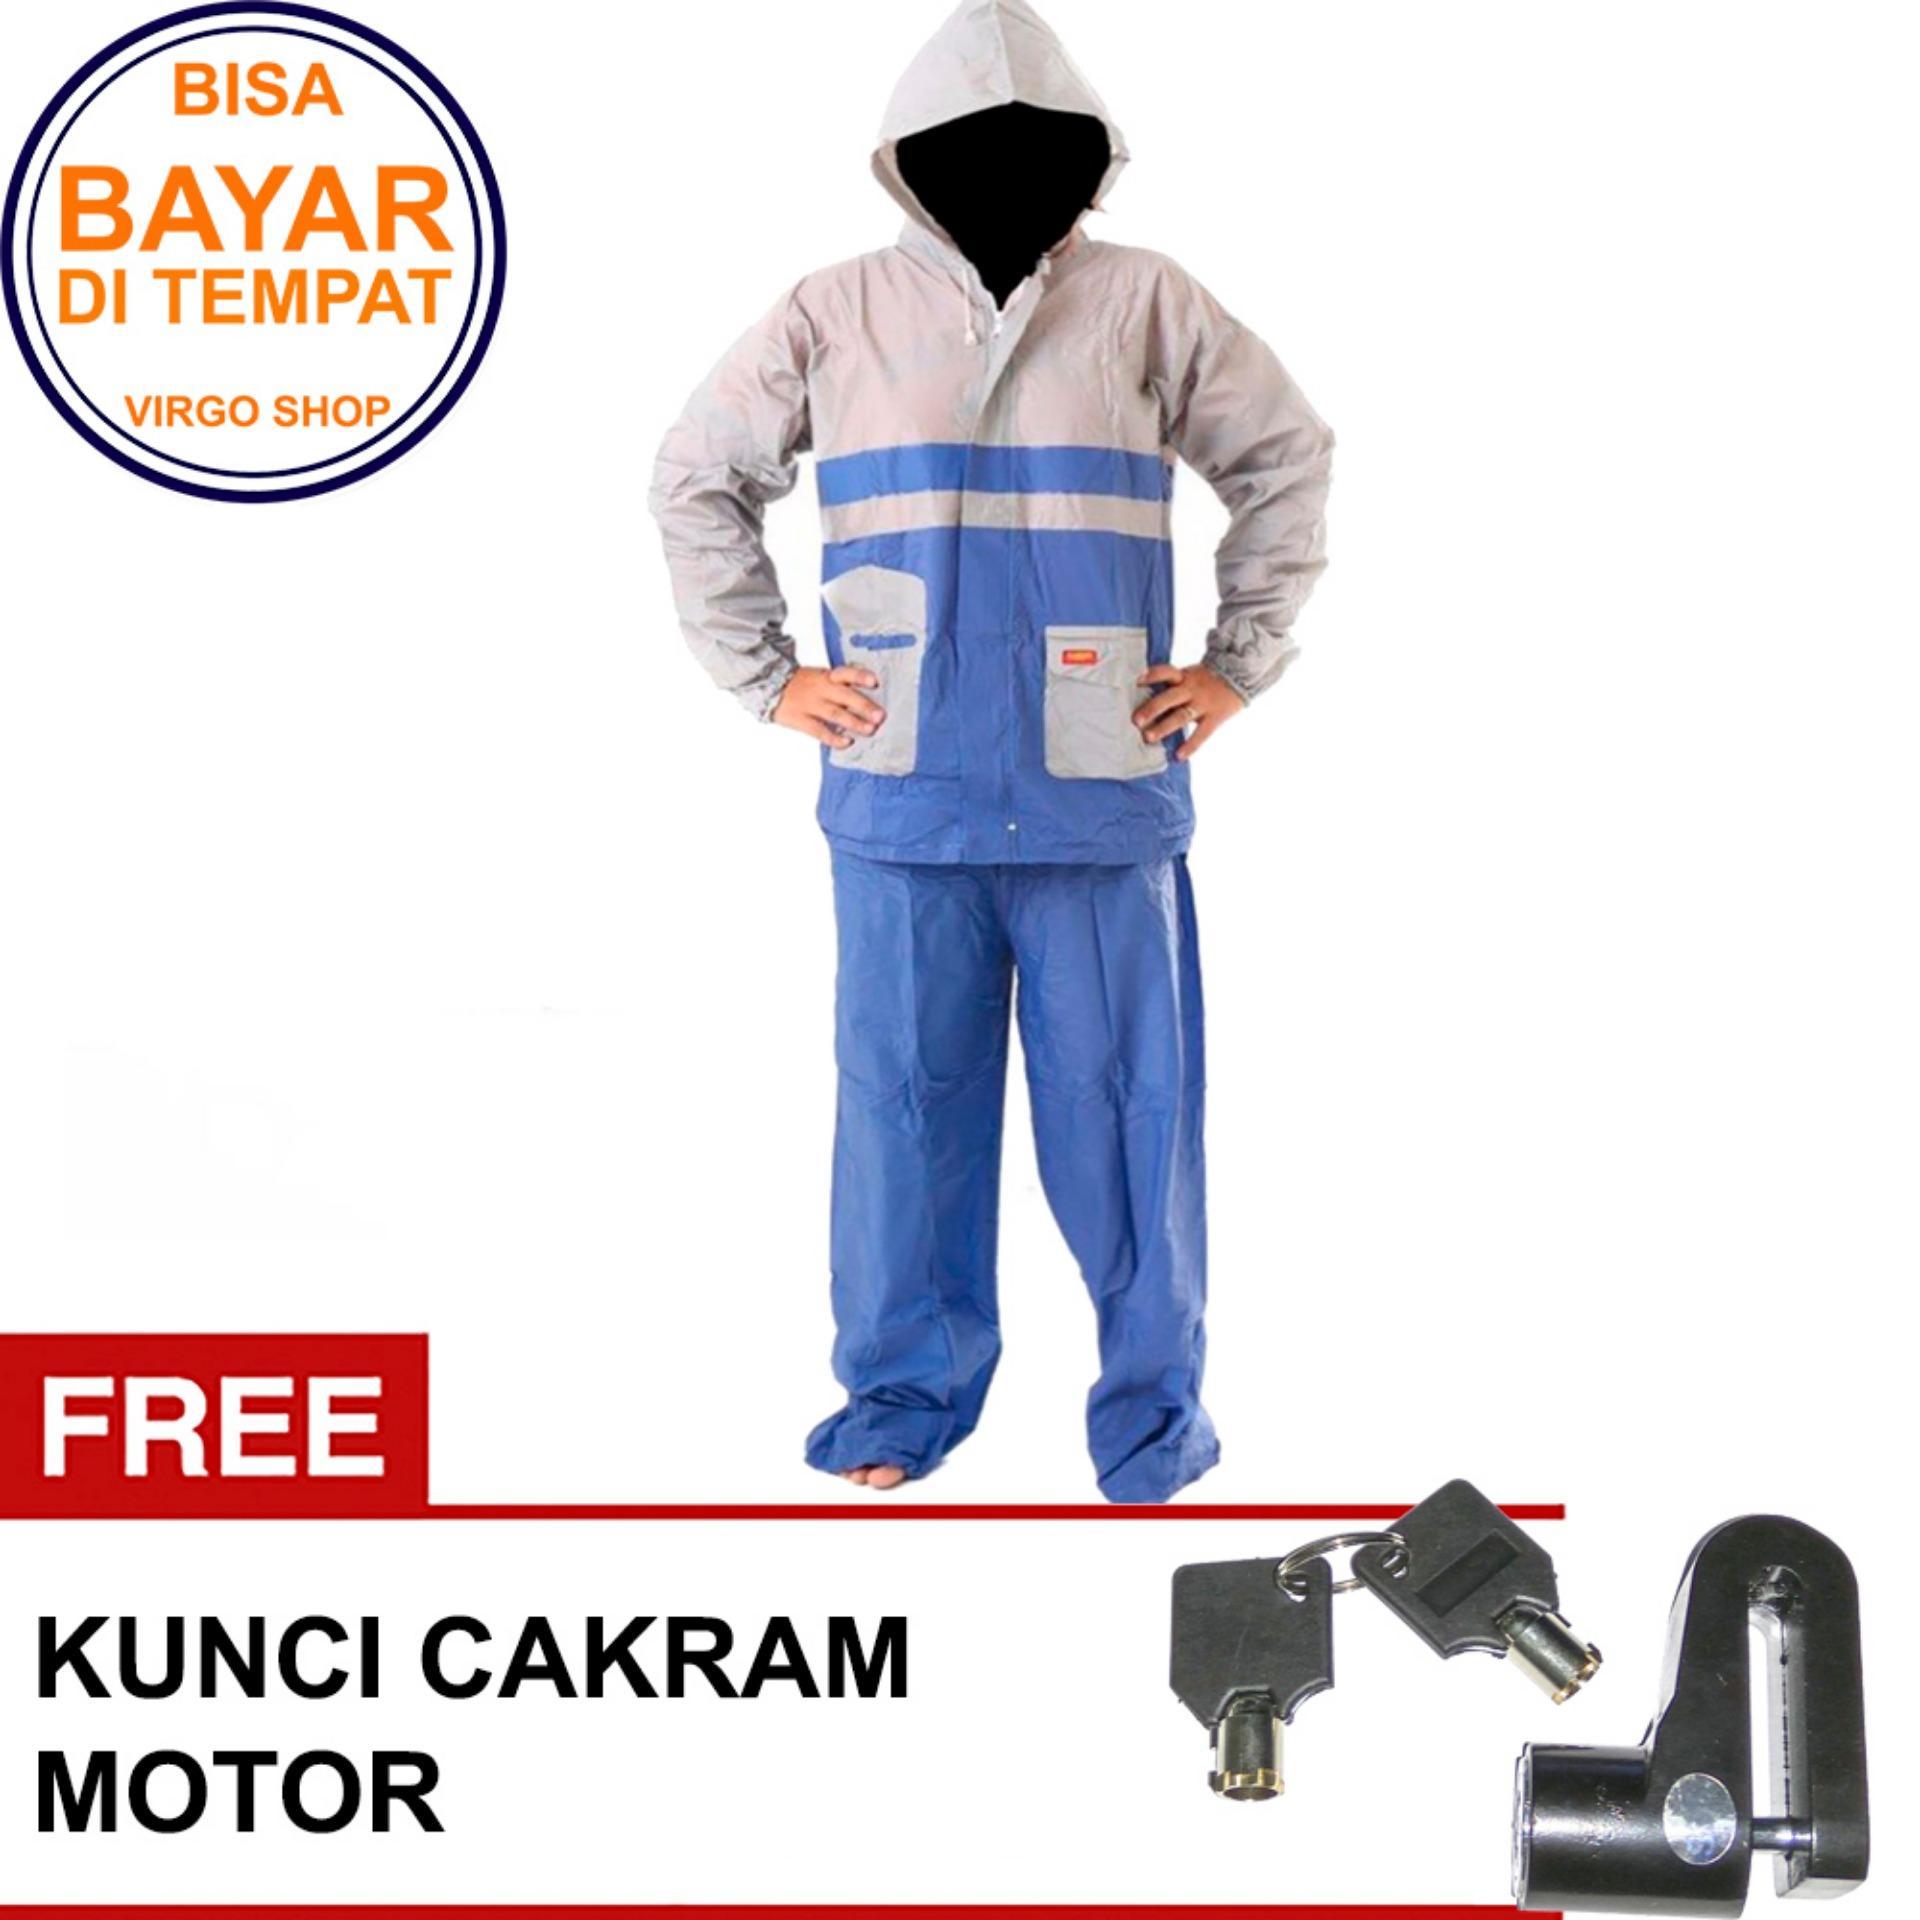 Termurah Elmondo Jas Hujan Setelan Baju Celana - New Kombinasi Tipe 905 Biru Bonus Kunci Disk Pendek